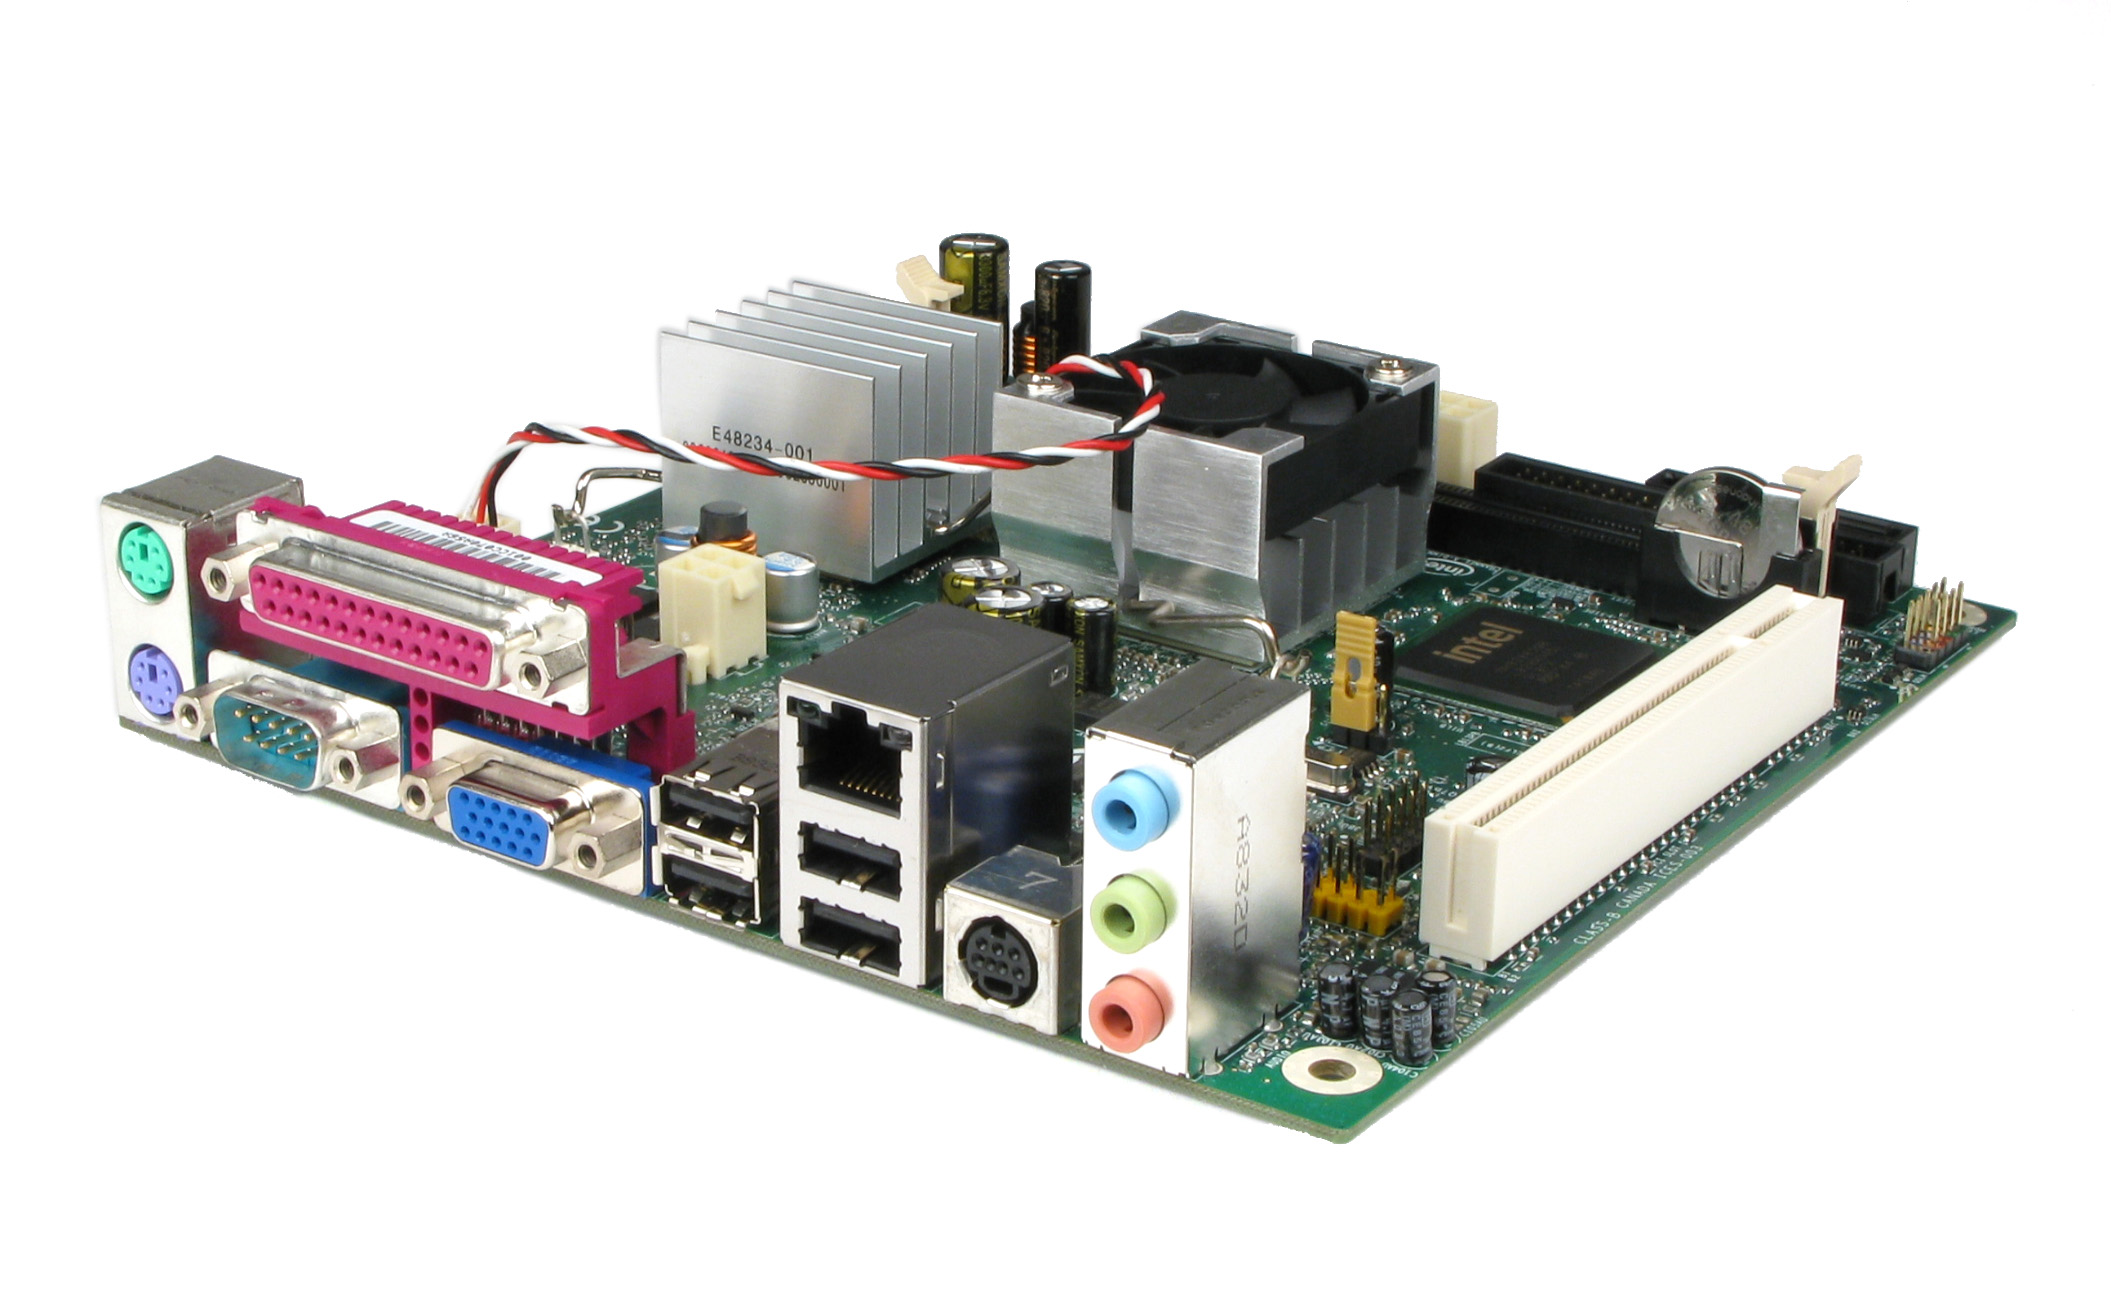 Intel\'s D945GCLF2 Little Falls 2: The DiAtomic Mainboard